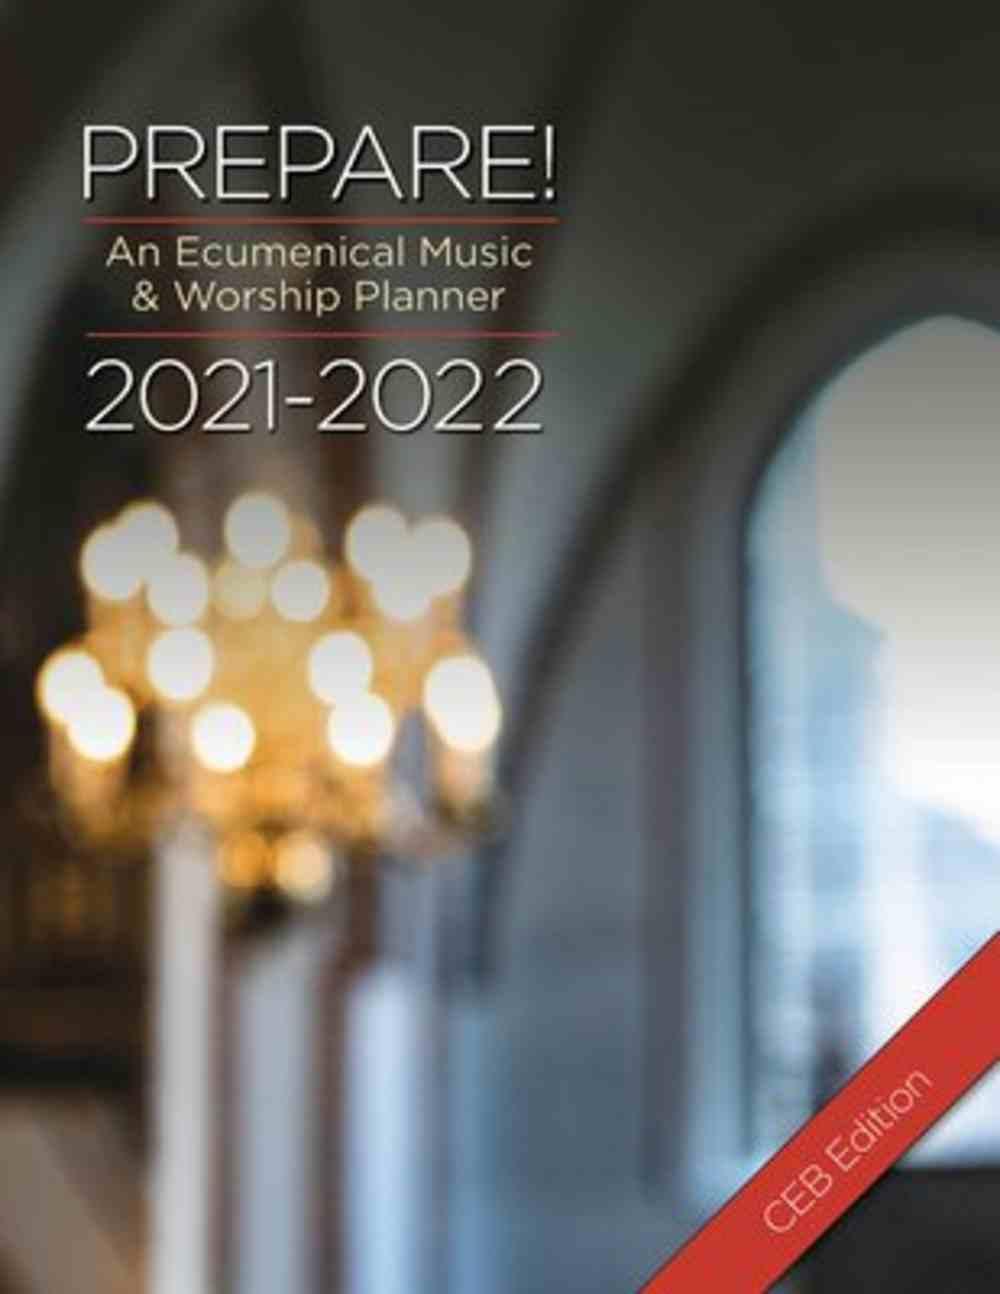 Prepare! 2021-2022 Ceb Edition: An Ecumenical Music & Worship Planner Spiral